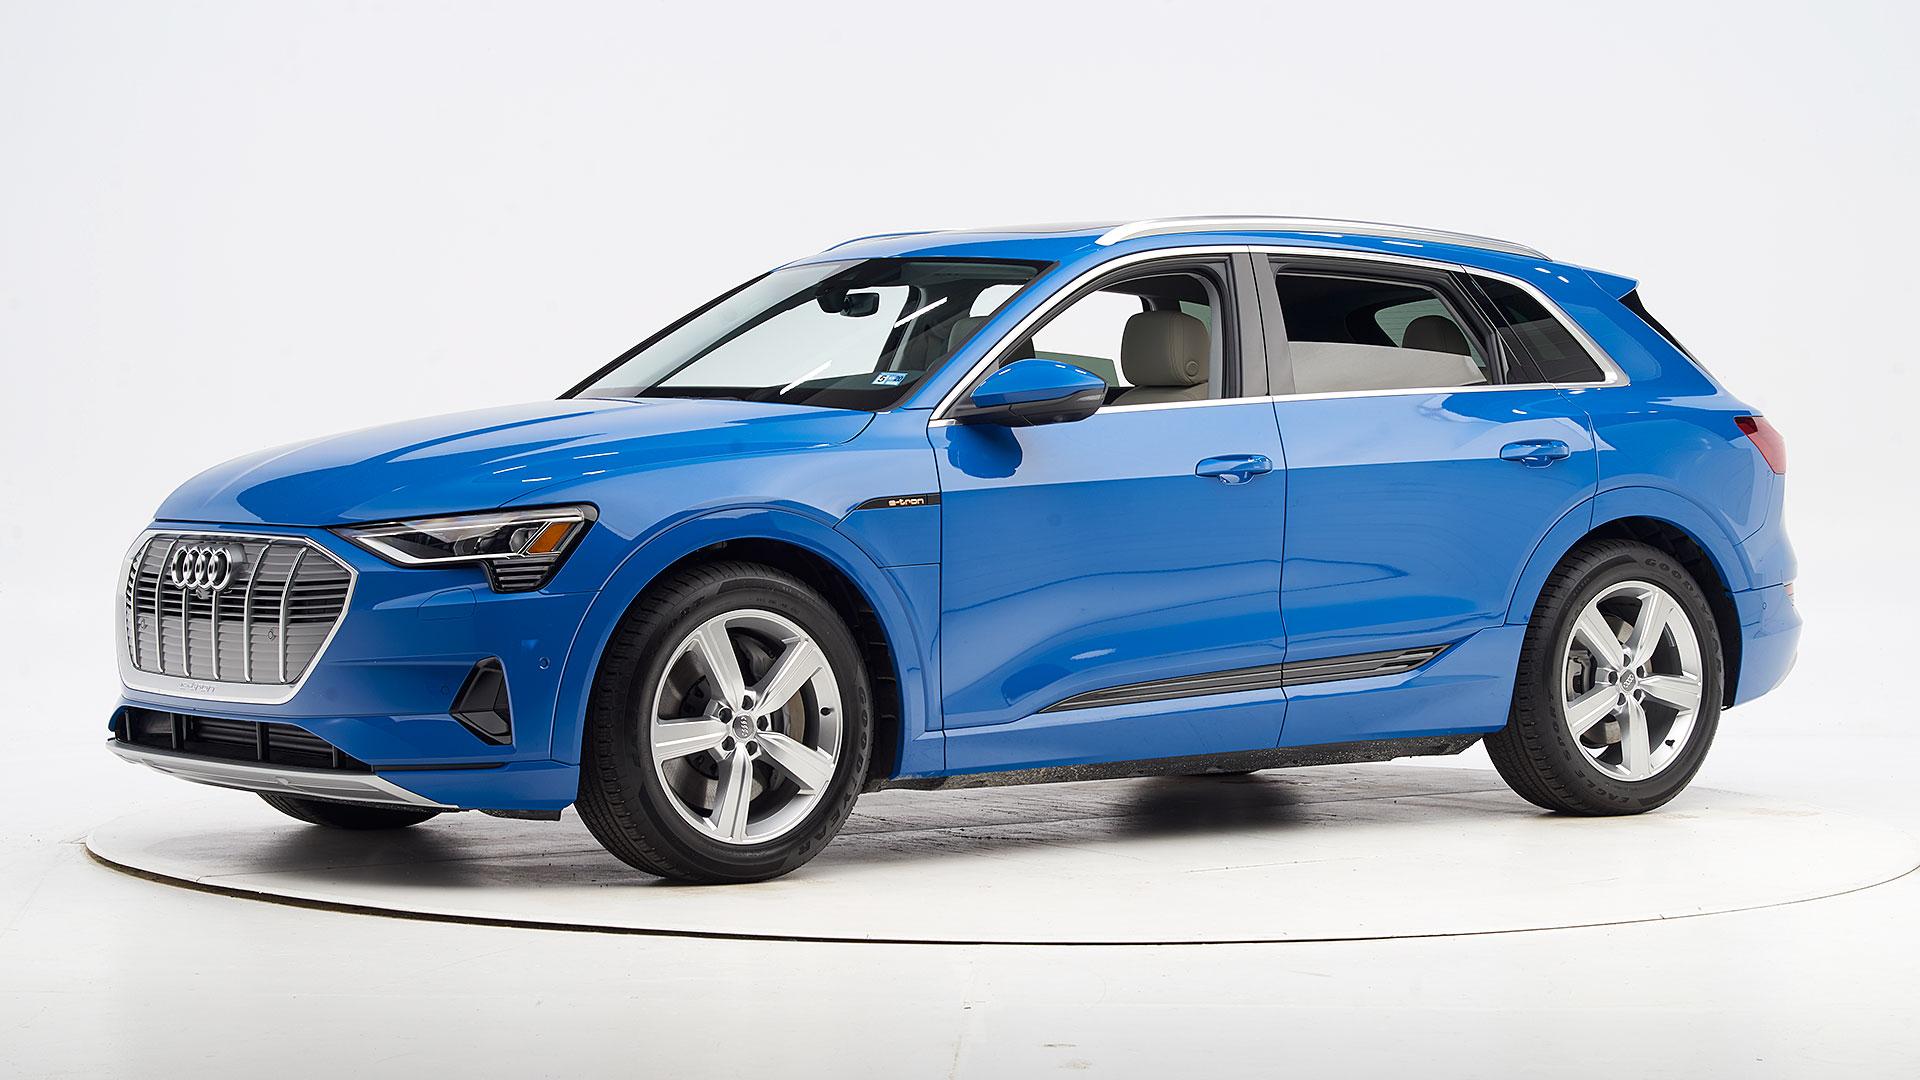 Audi e-tron Captures Top Safety Pick+ Award